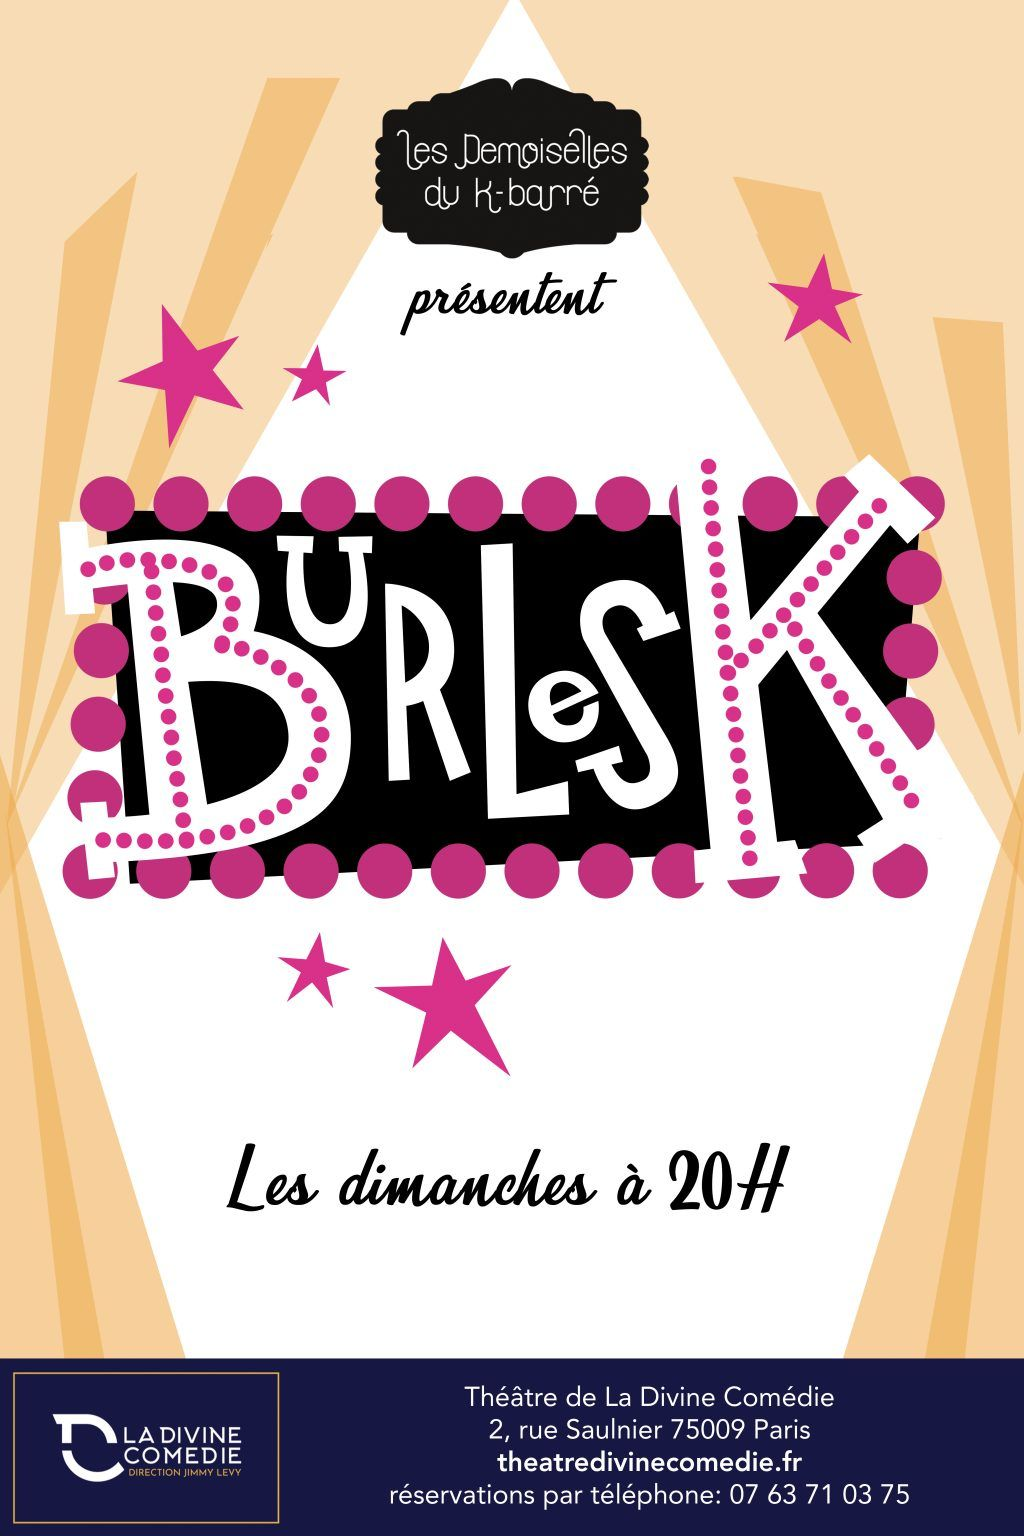 cabaret-effeuillage-burlesK-humour-feelgood-EVJF-burlesque-comédie-cabaretburlesque-les demoiselles